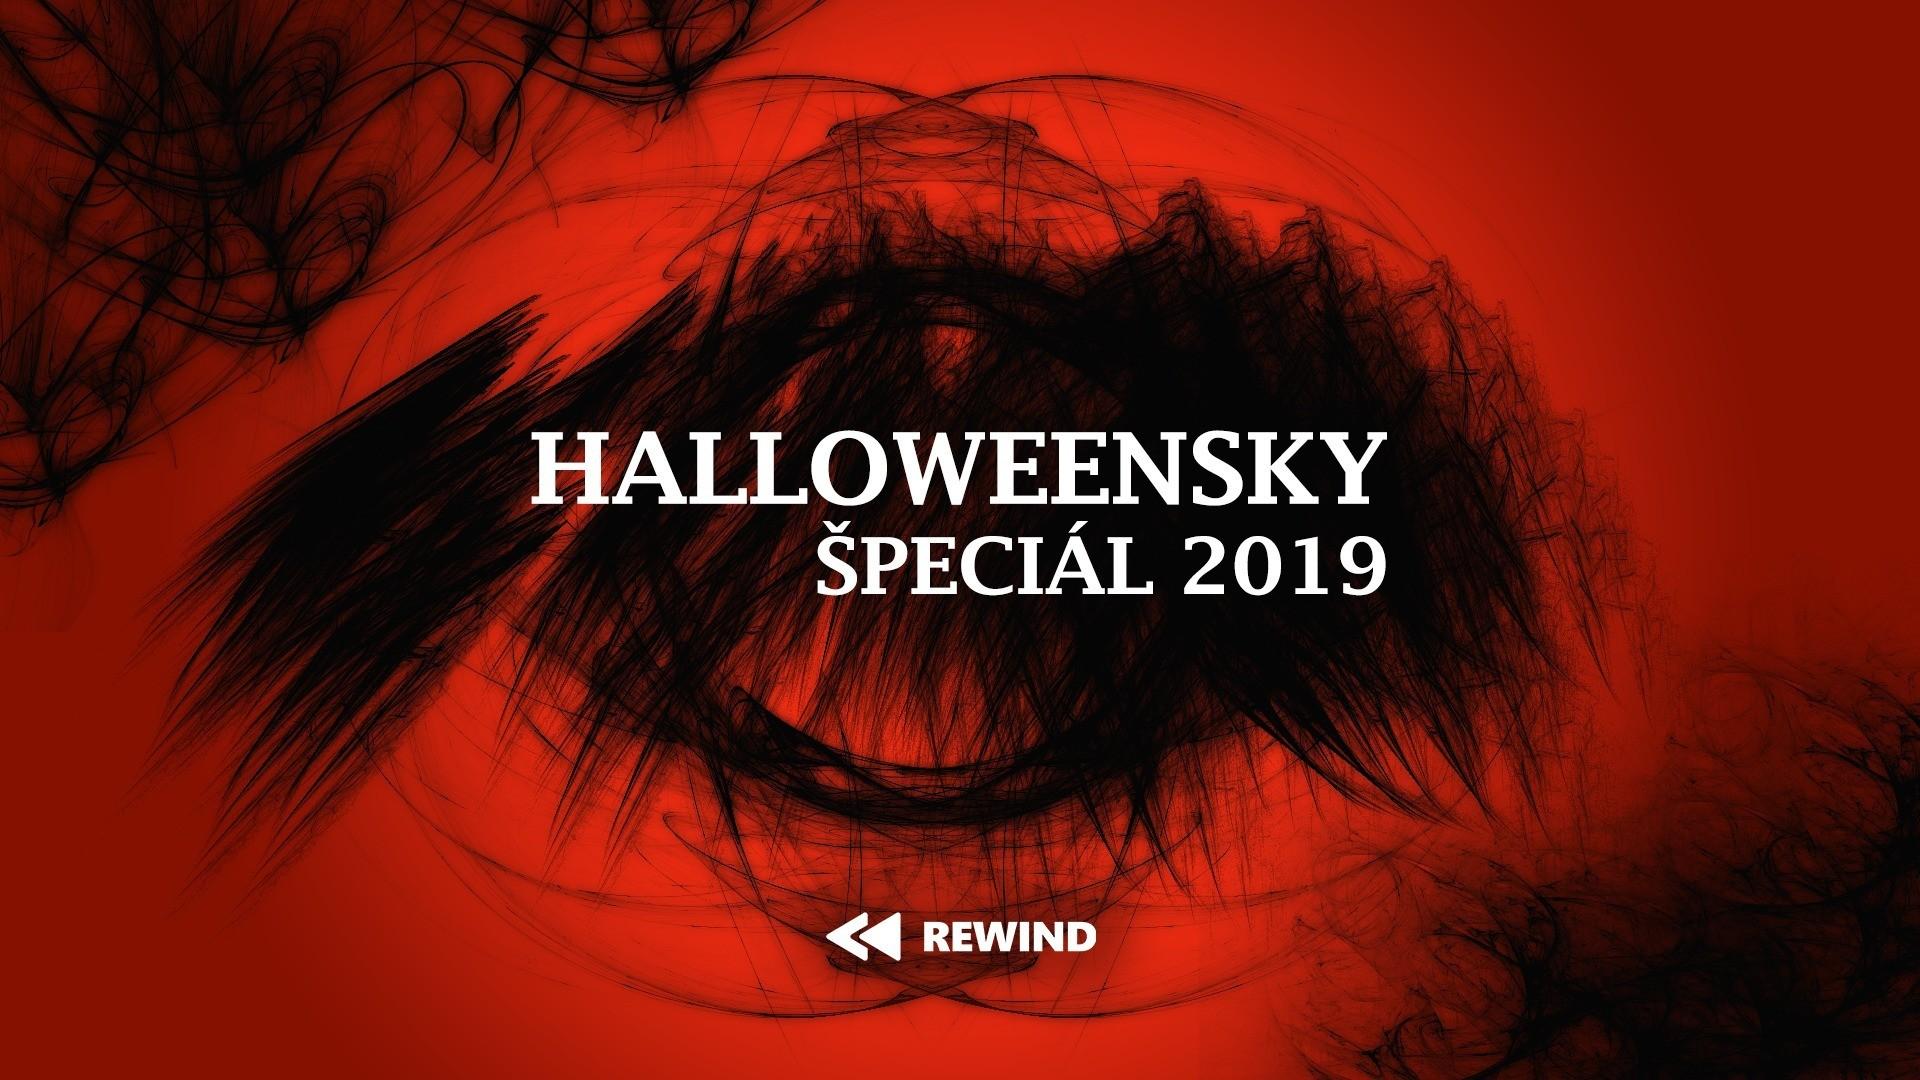 halloweensky-special